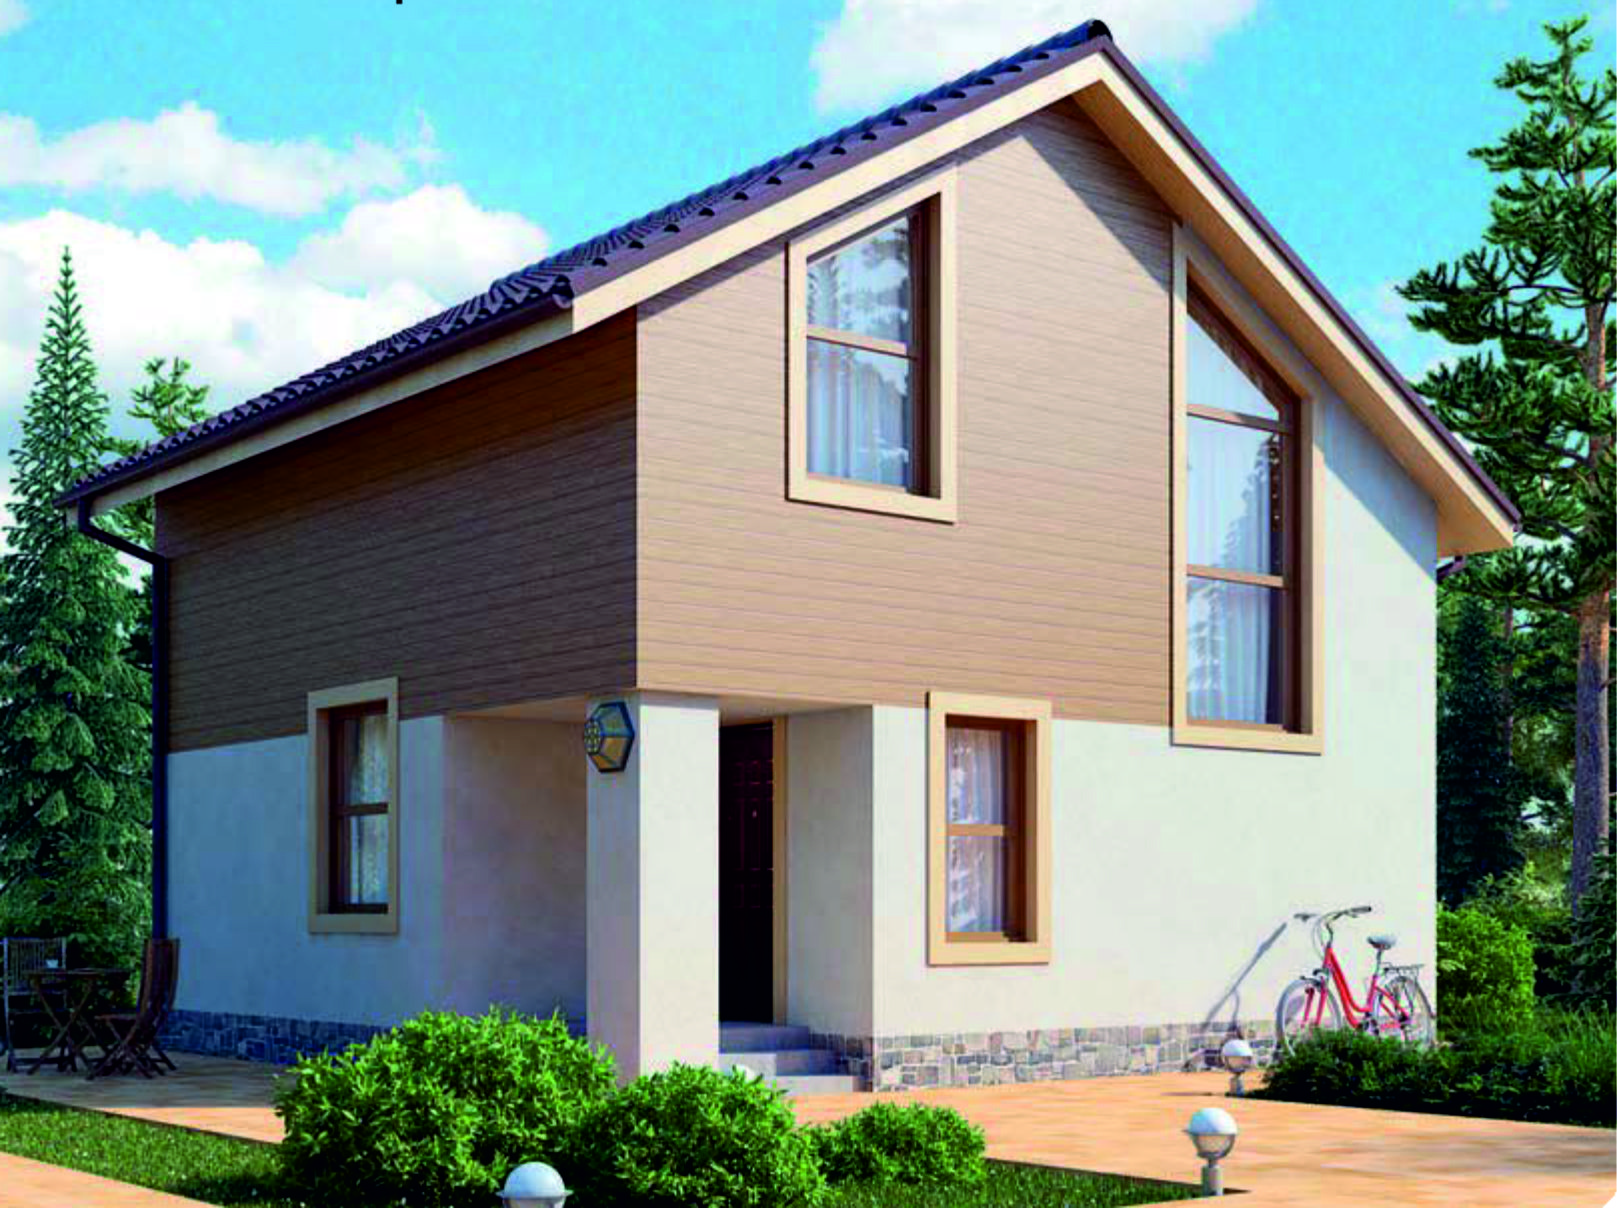 проект дома из газобетона JB-2053 строительство под ключ за 35000 р./м2 <br>итого 2 938 200 рублей